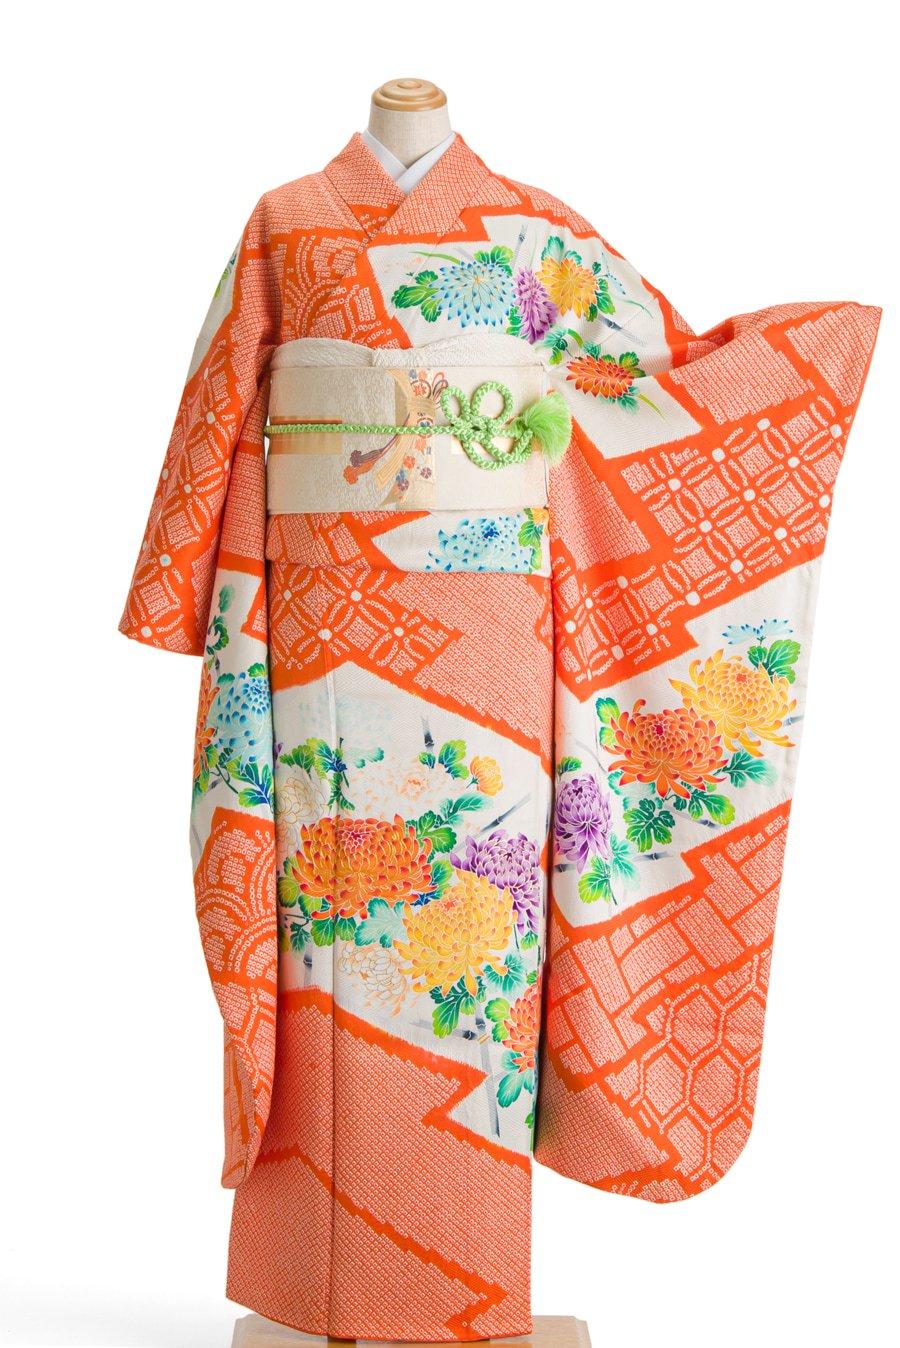 「振袖 大輪菊」の商品画像